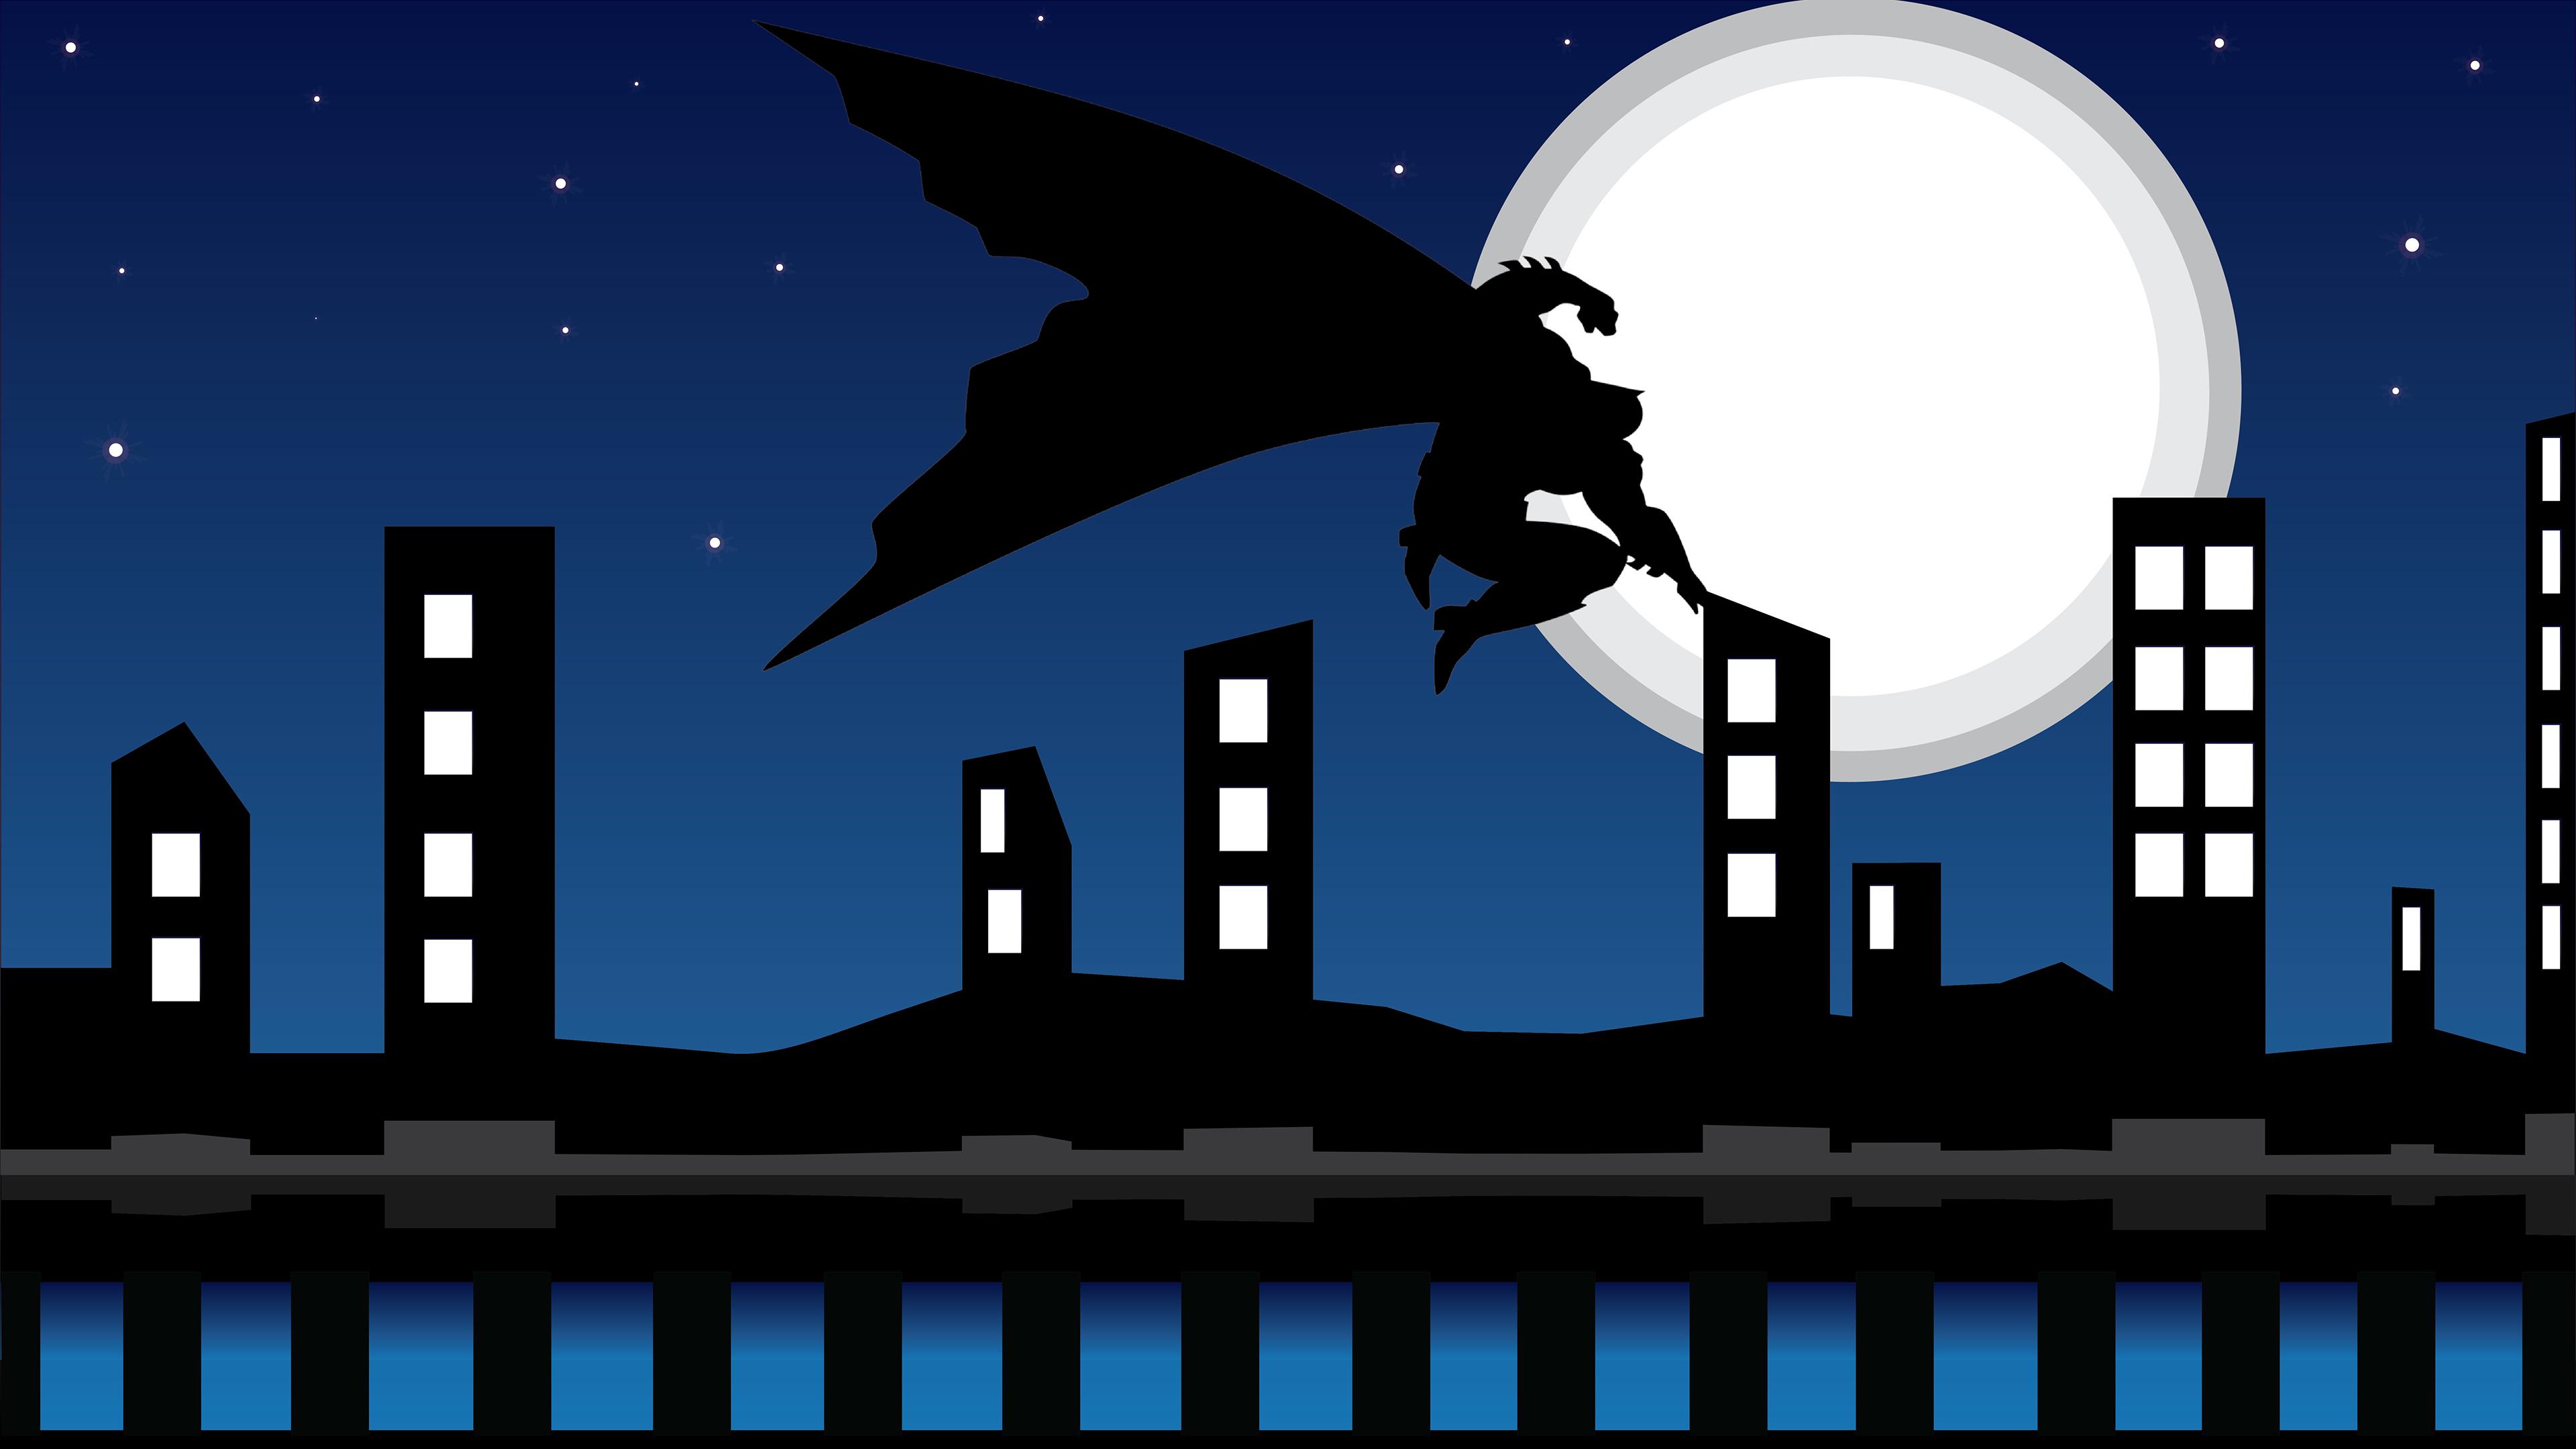 batman graphic design 4k 1544286772 - Batman Graphic Design 4k - superheroes wallpapers, hd-wallpapers, behance wallpapers, batman wallpapers, artwork wallpapers, artist wallpapers, 4k-wallpapers